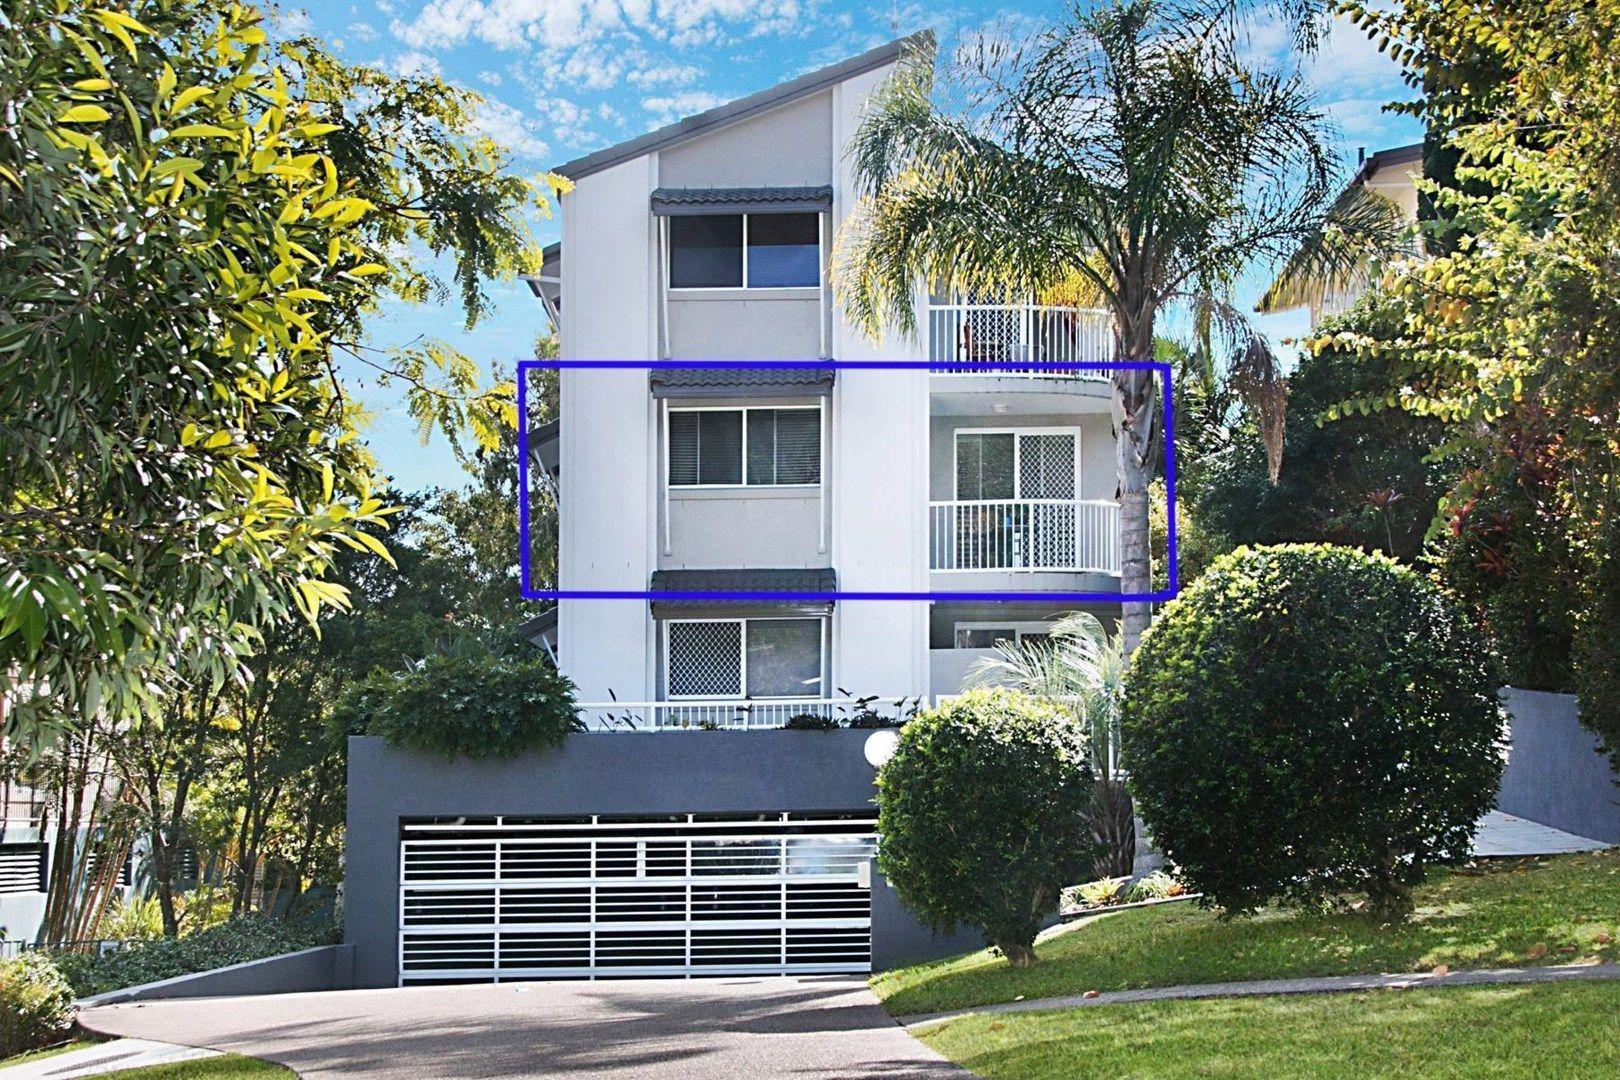 3/17 George Street East Street, Burleigh Heads QLD 4220, Image 0